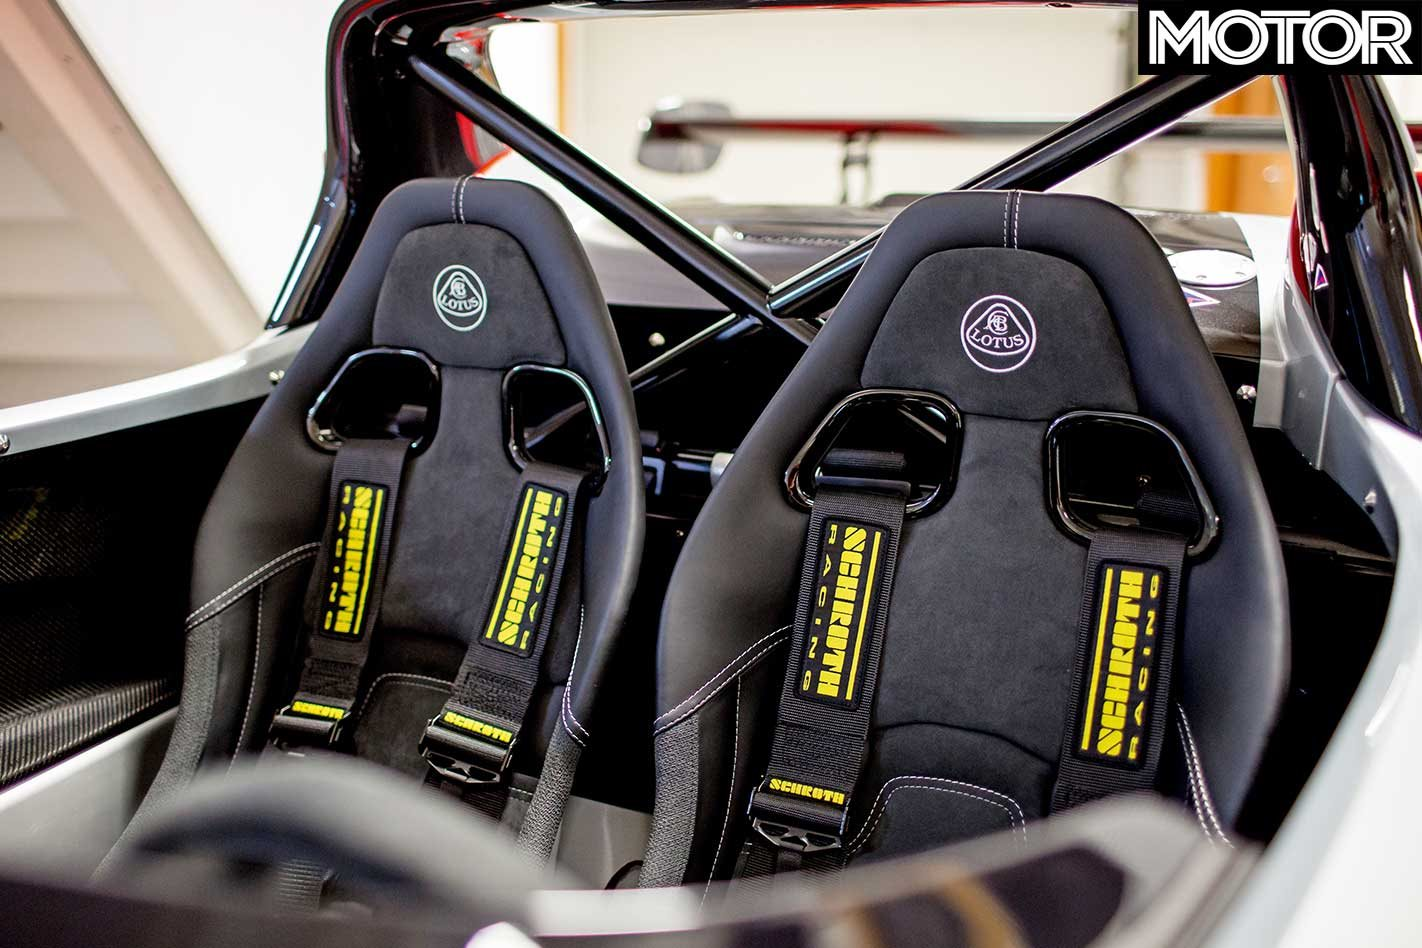 5775bea74c60 2018 Lotus 3-Eleven performance review